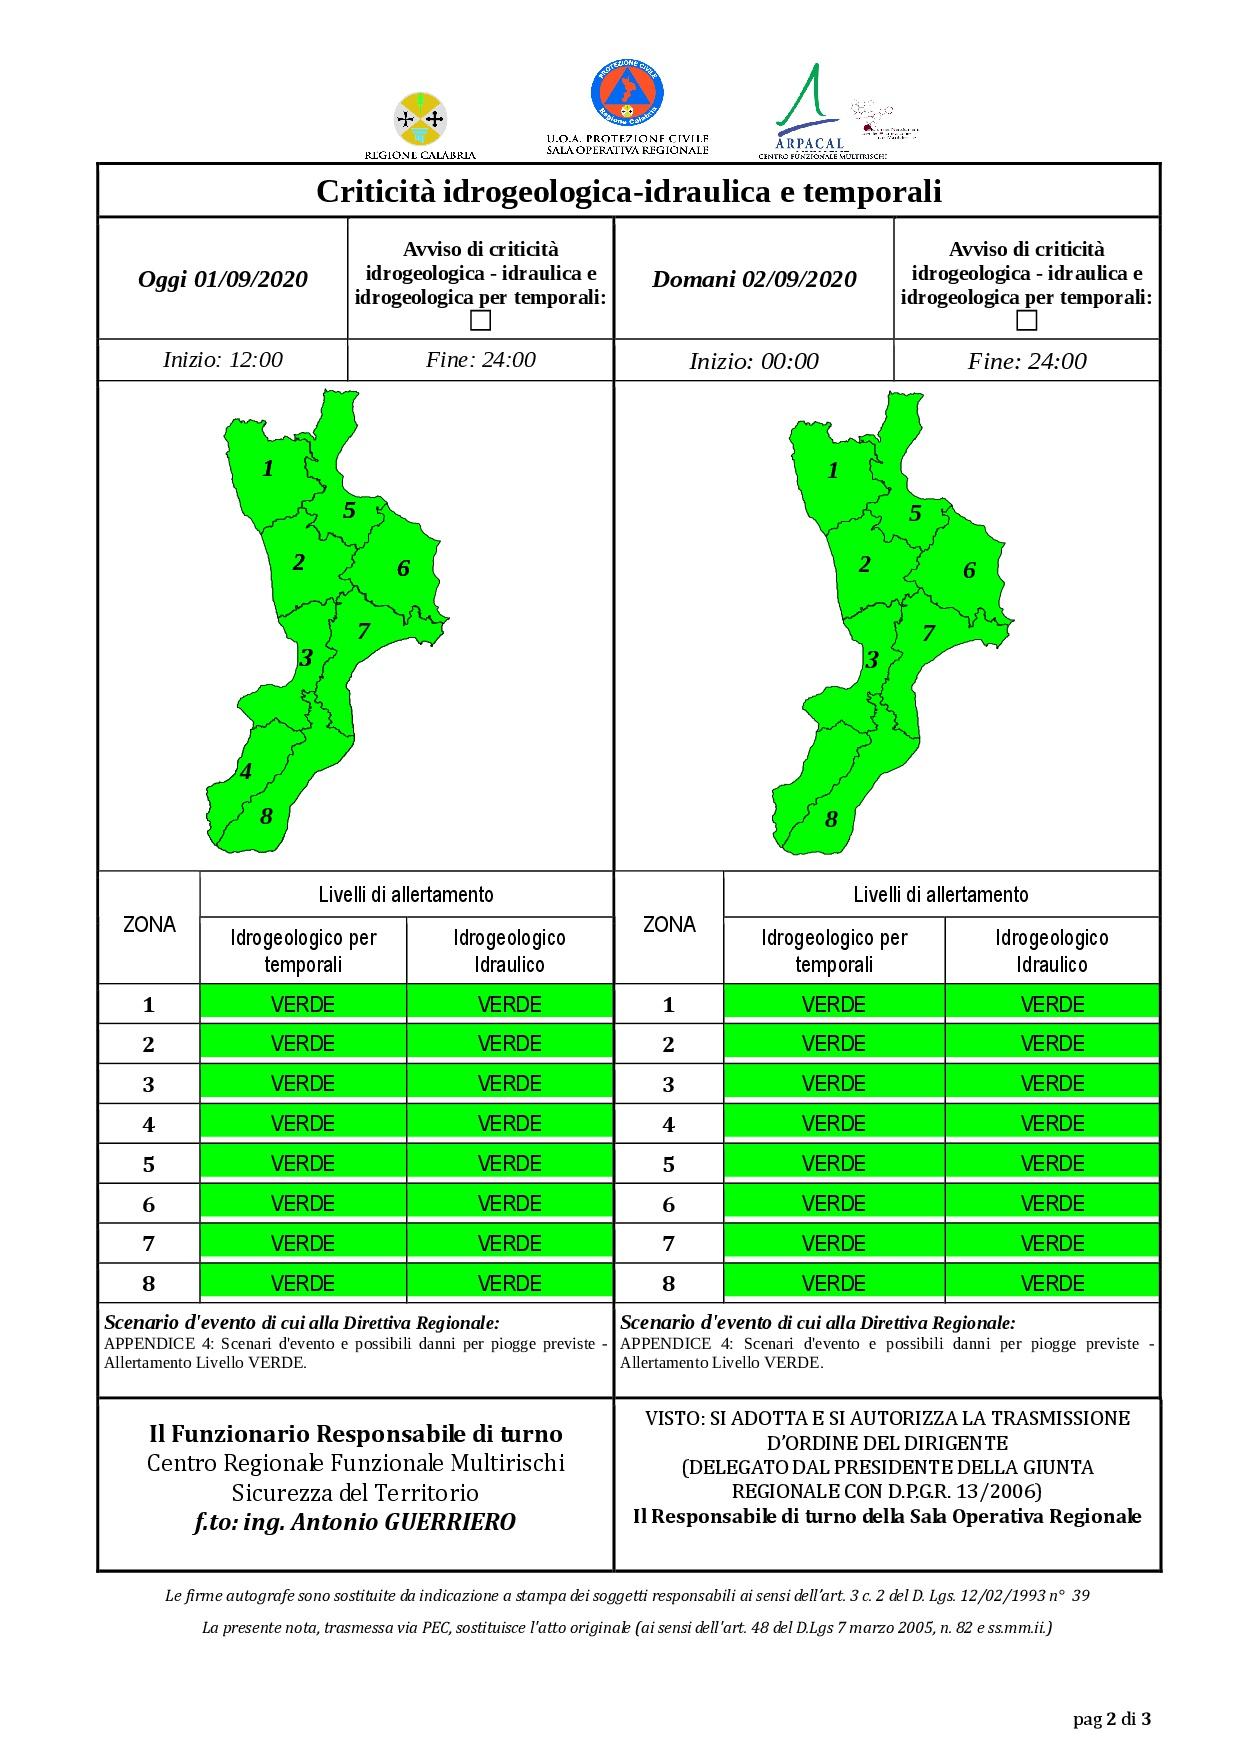 Criticità idrogeologica-idraulica e temporali in Calabria 01-09-2020